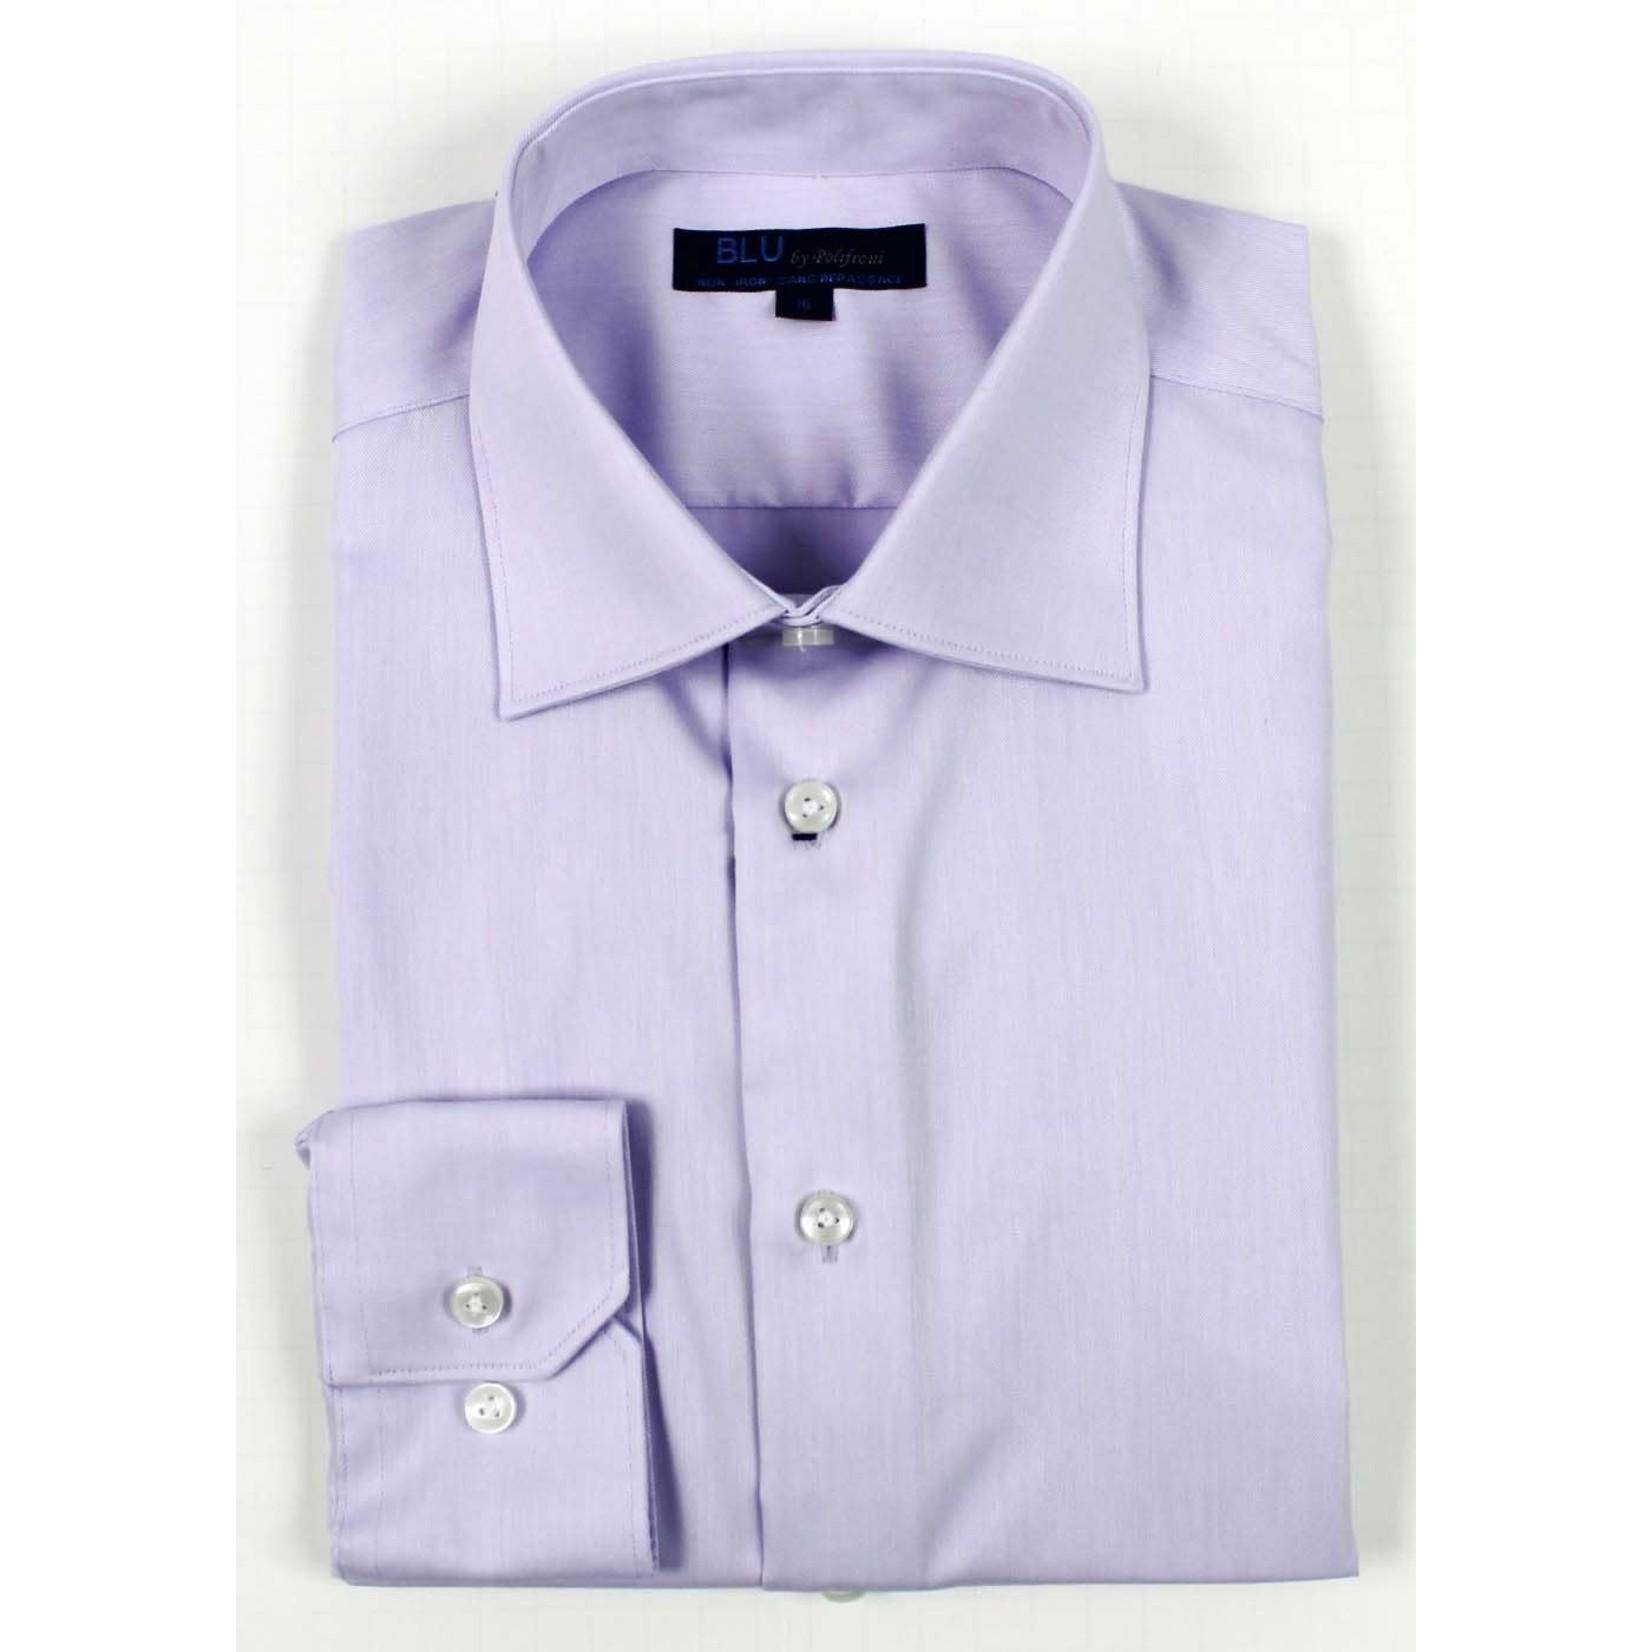 Polifroni Blu-360M Miami Non-Iron Dress Shirt 60 Lavender